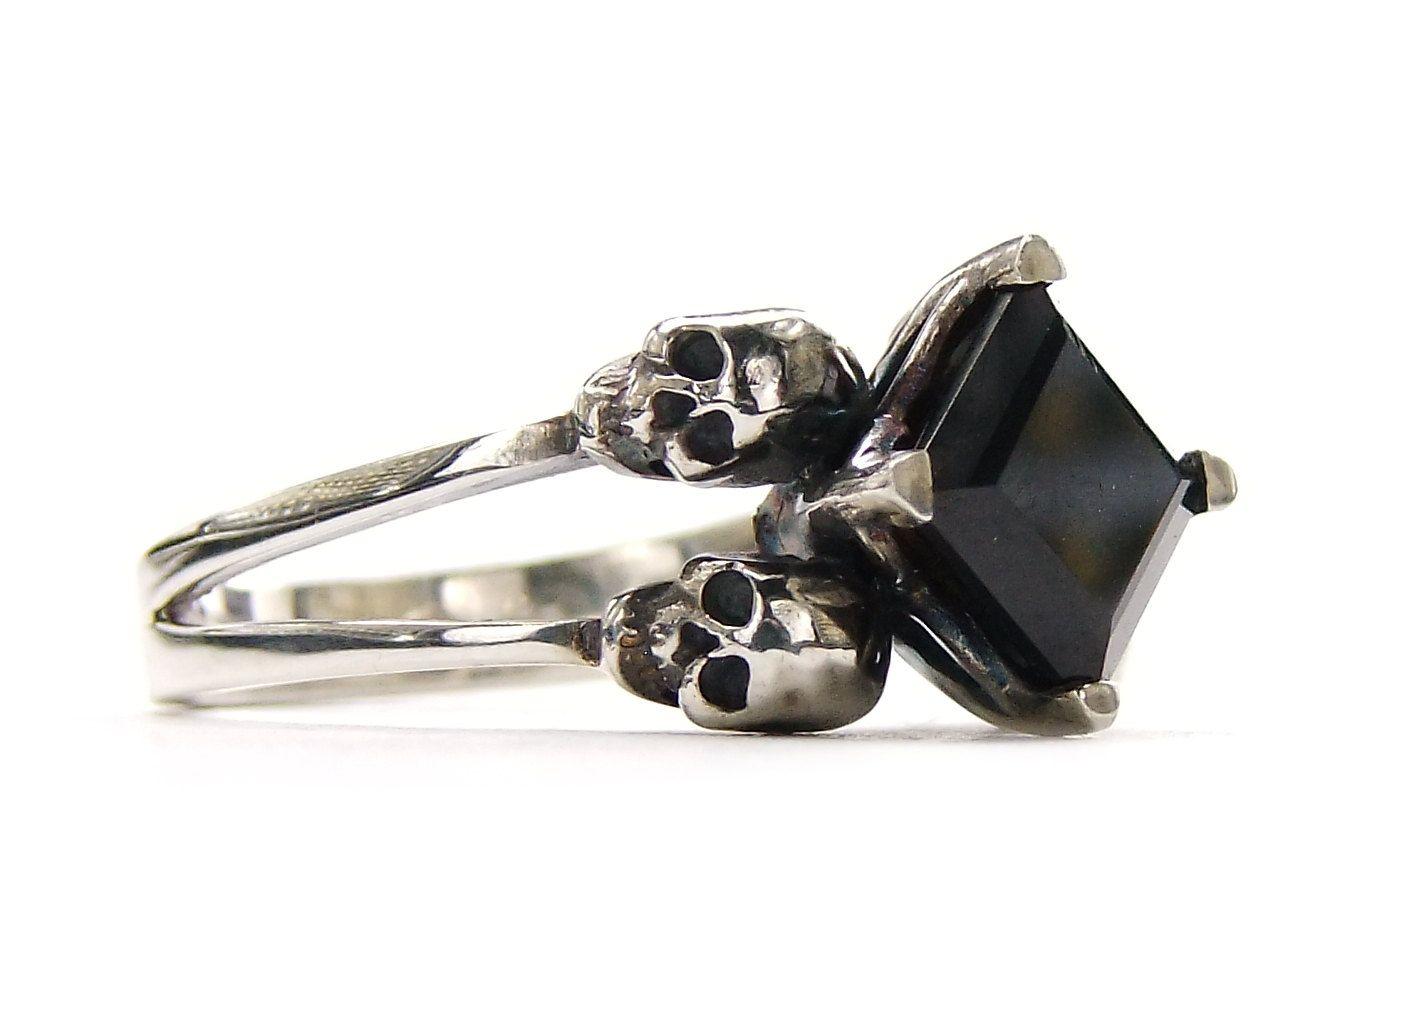 skull wedding ring square black spinel memento mori sterling jewel